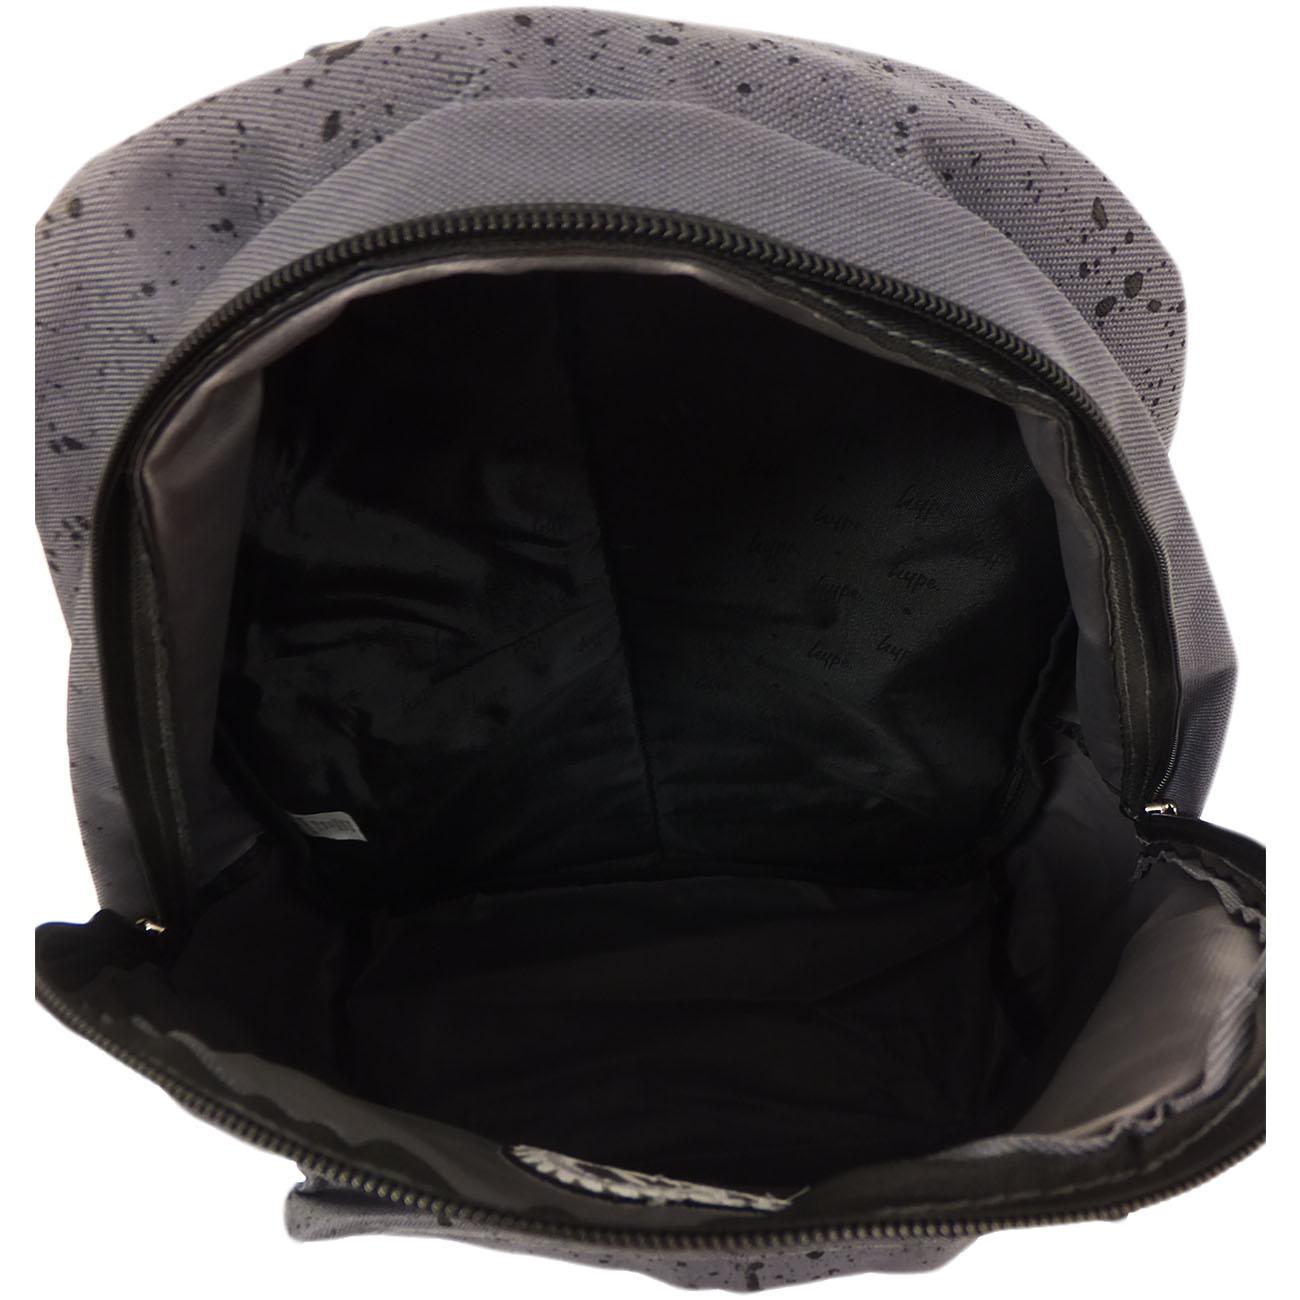 Unisexe-Hype-Sac-A-Dos-Ecole-Gym-SACS-pochettes-pencil-case miniature 202